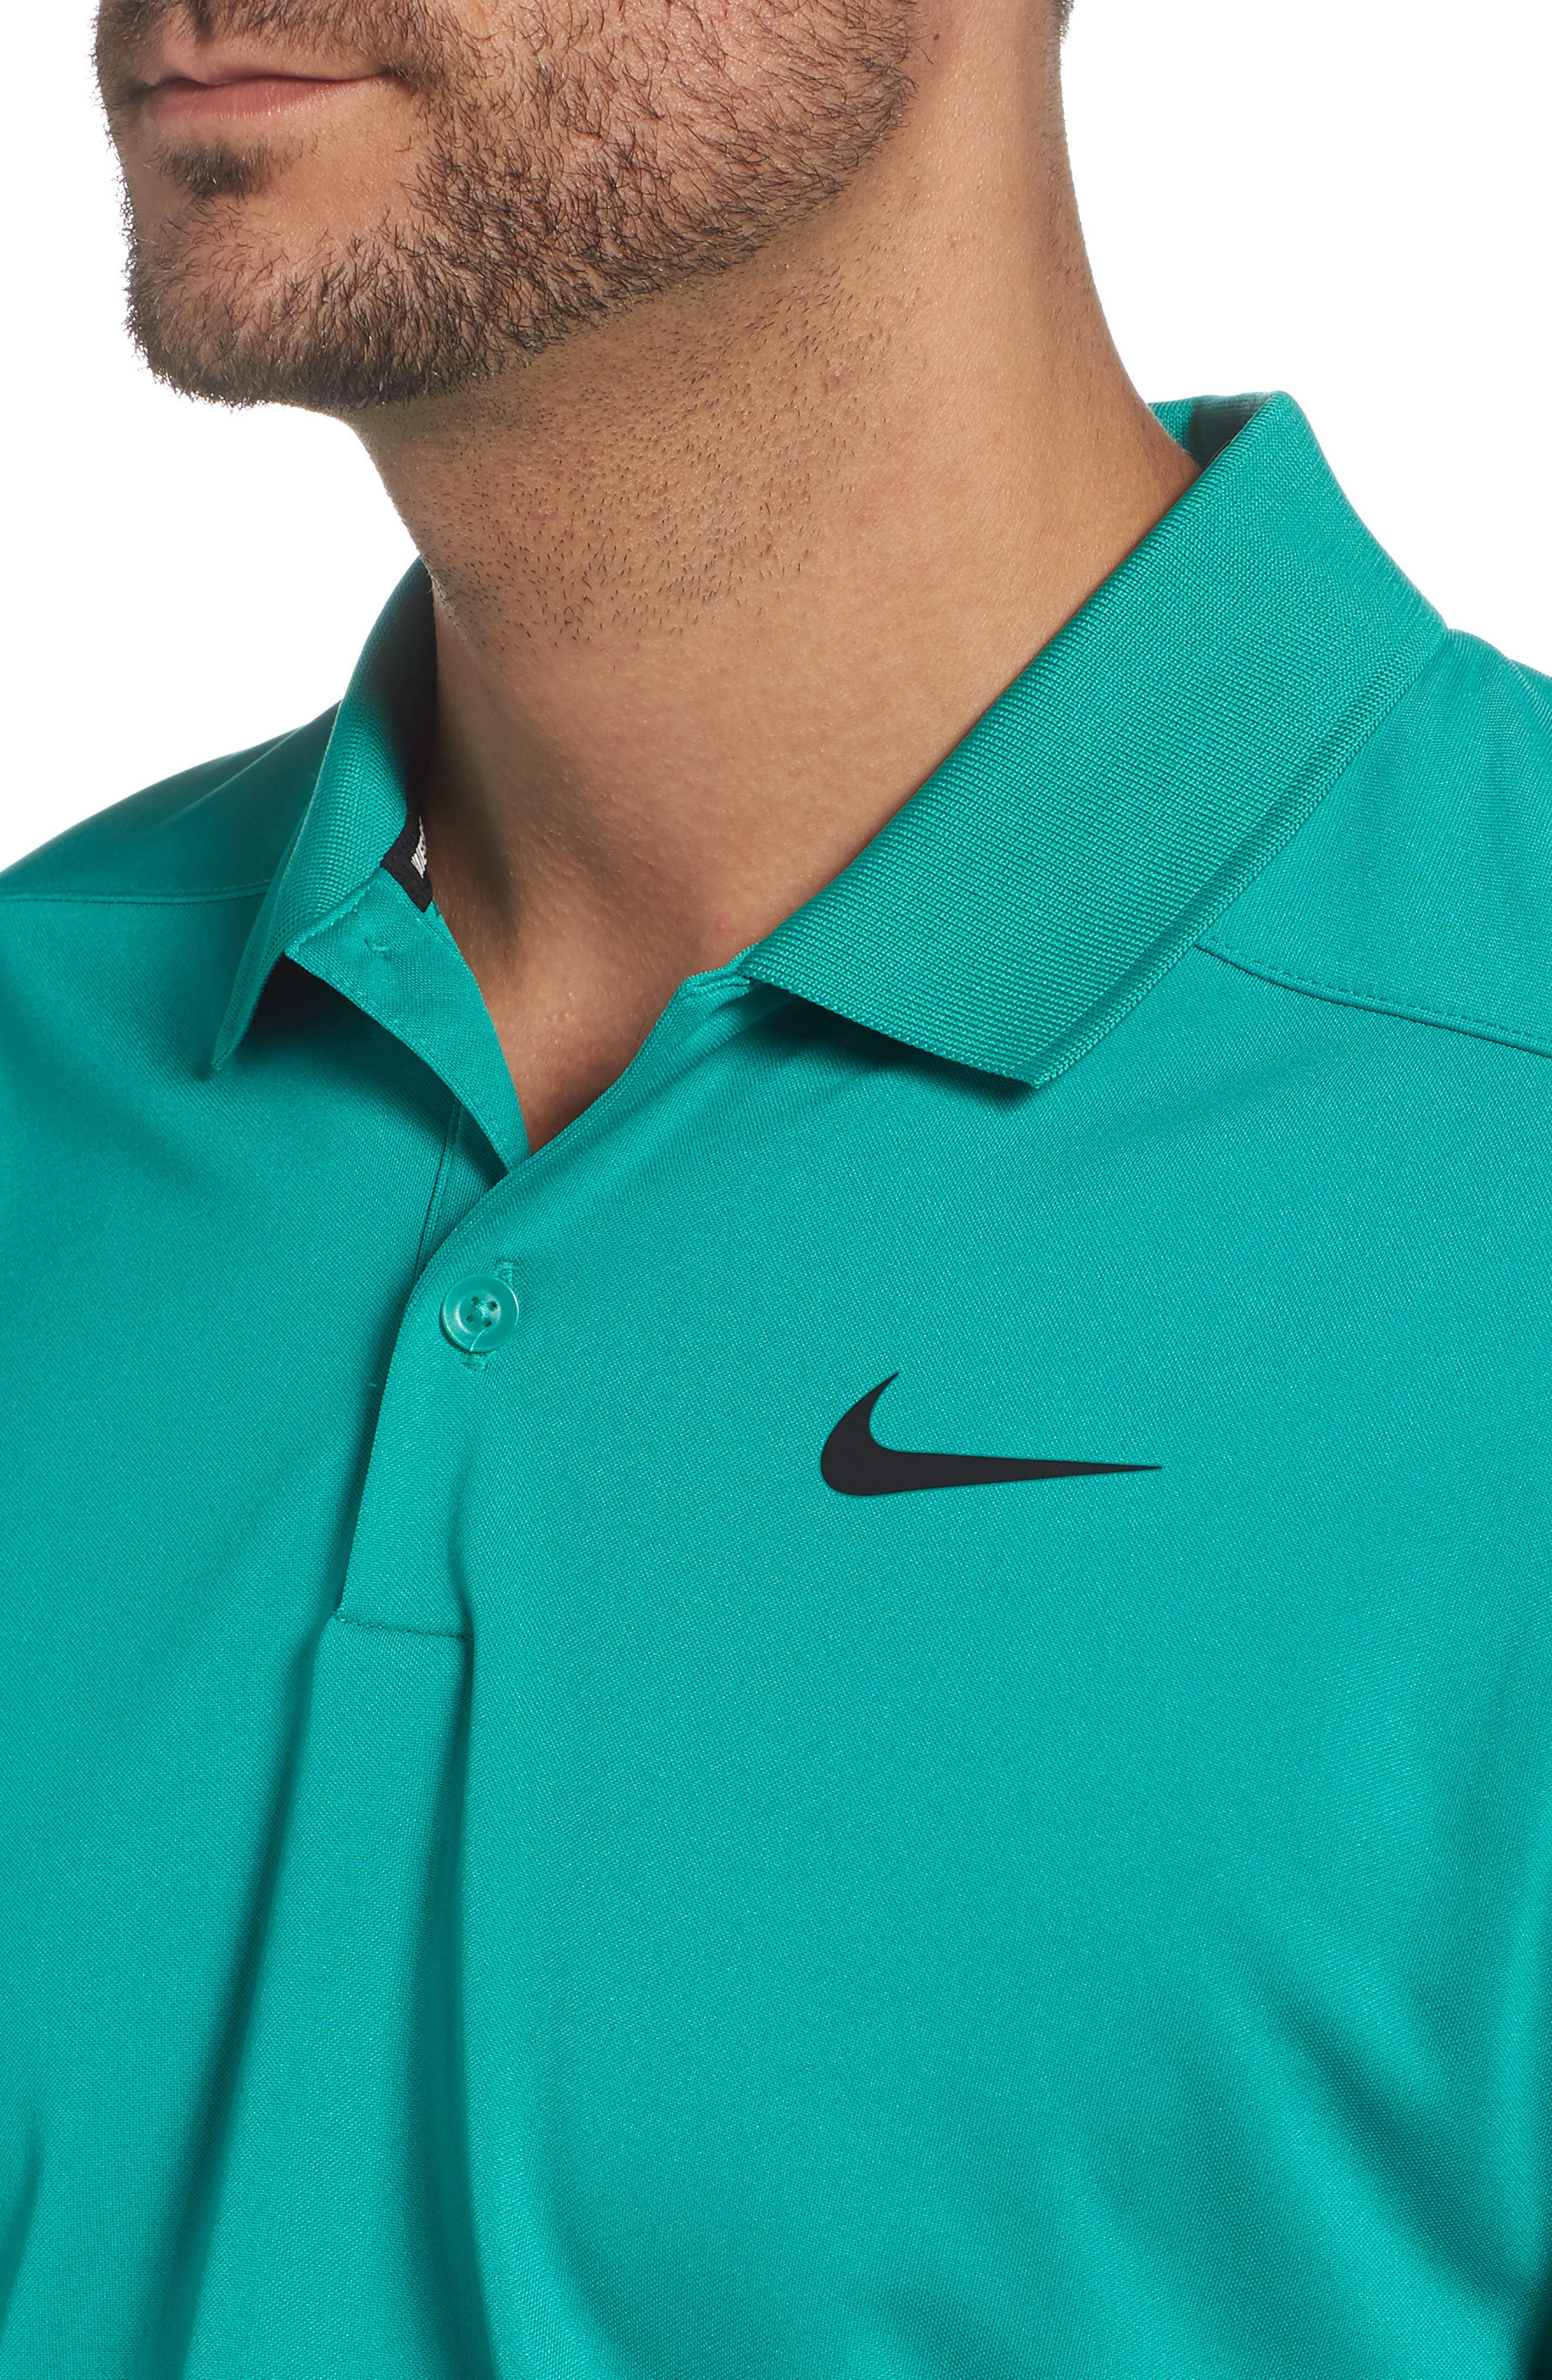 Dry Victory Golf Polo,                             Alternate thumbnail 4, color,                             NEPTUNE GREEN/ BLACK